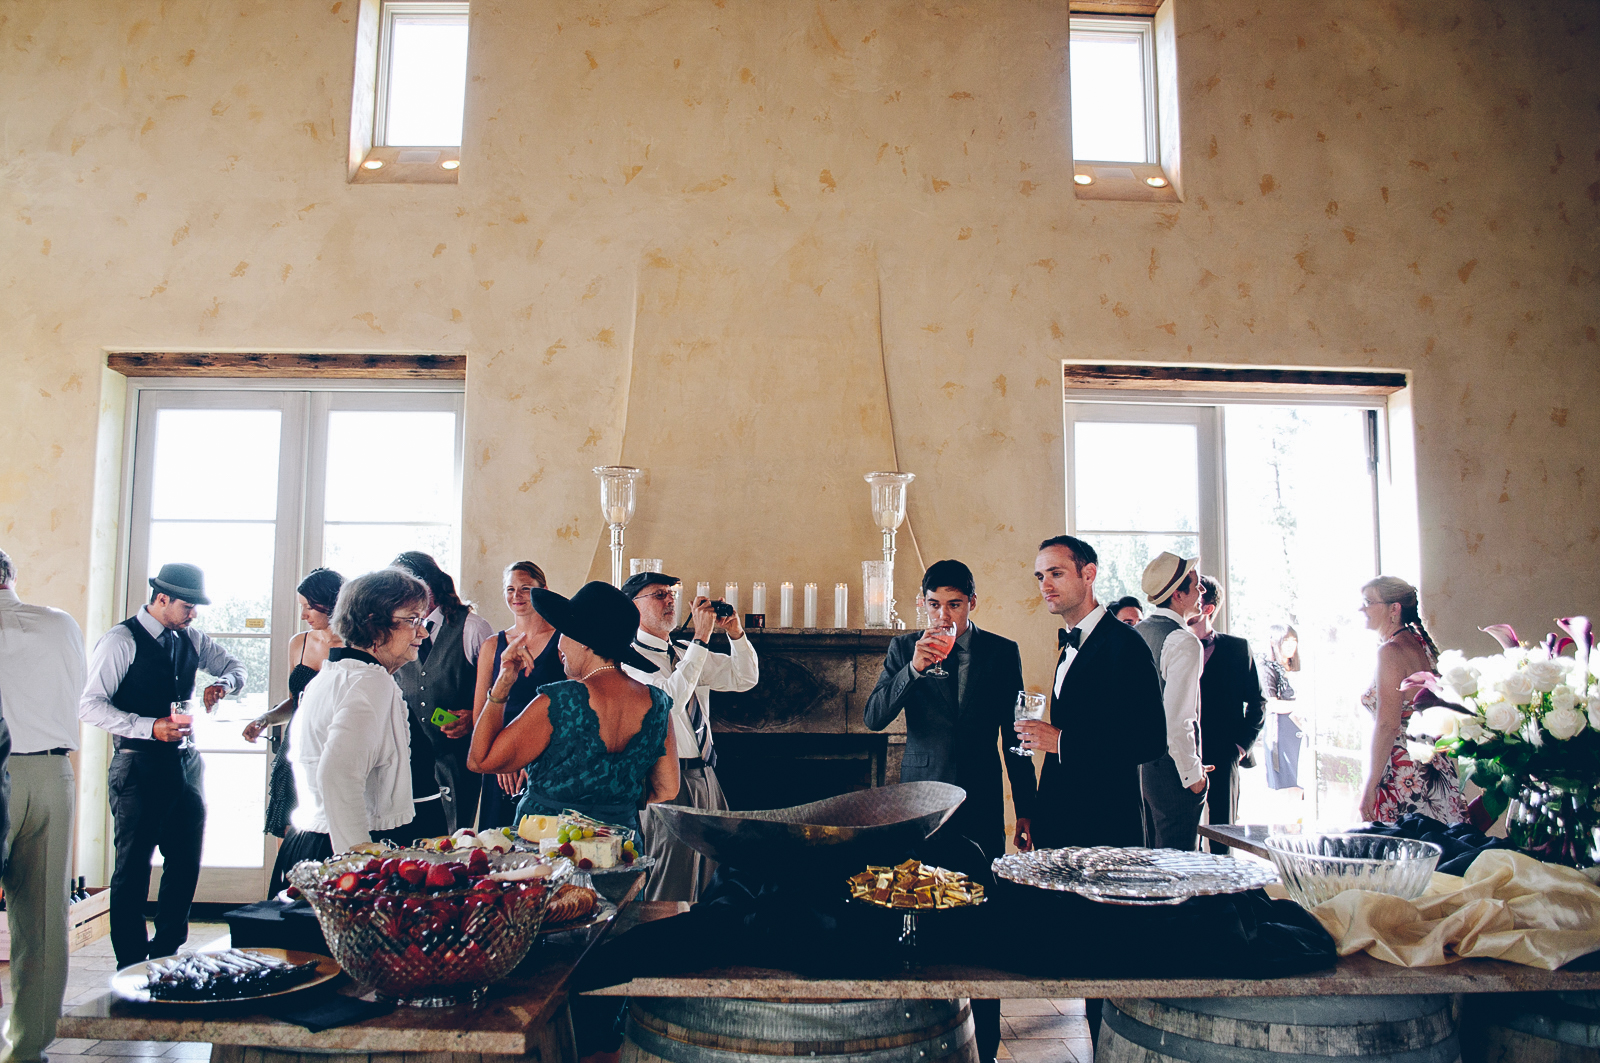 miraflores_winery_wedding_photography_ian_melissa_ebony_siovhan_bokeh_photography_20.jpg